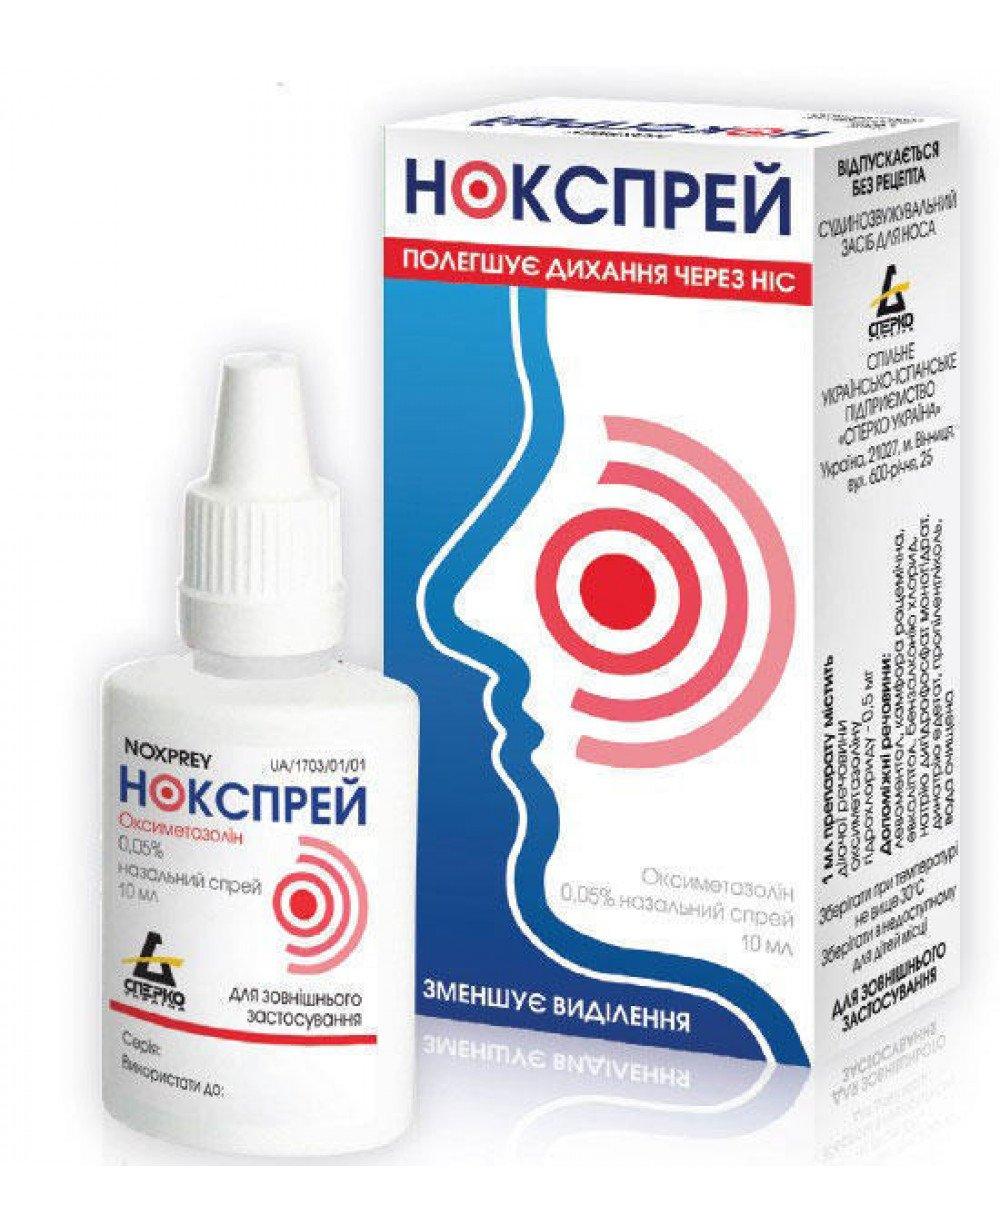 Noxspray (Oxymetazoline) spray 0.05% 10 ml.